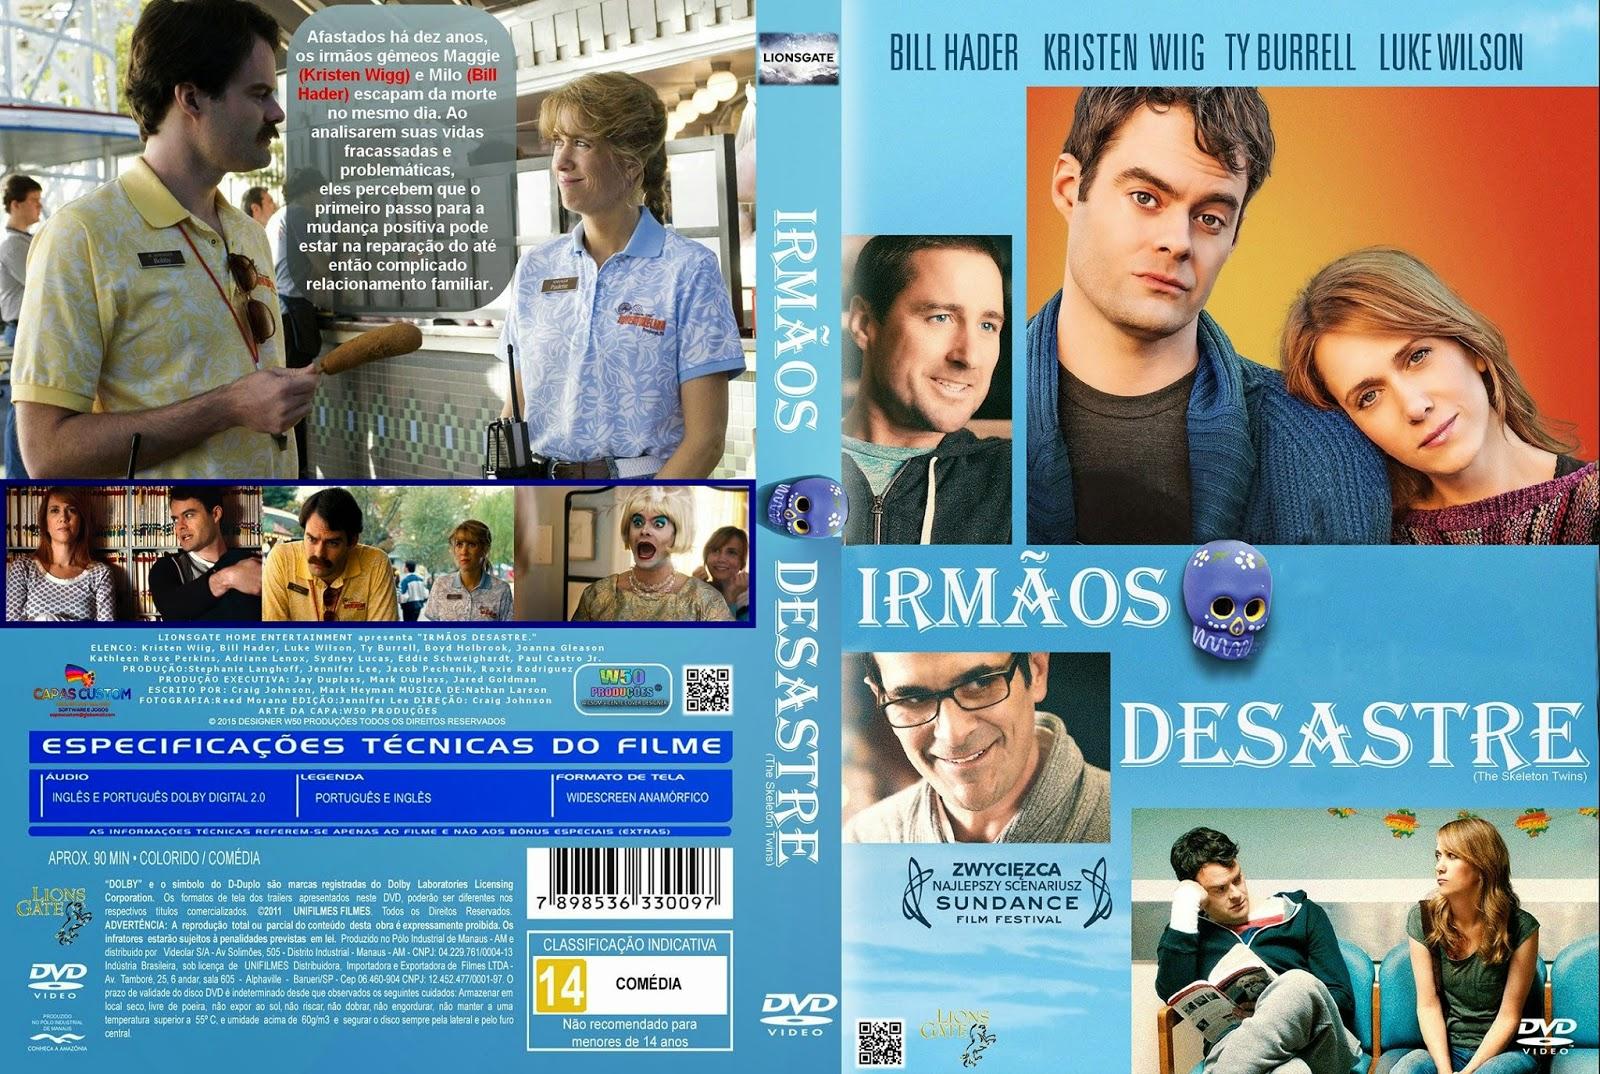 Download Irmãos Desastre DVD-R AUTORADO BkpVJMN